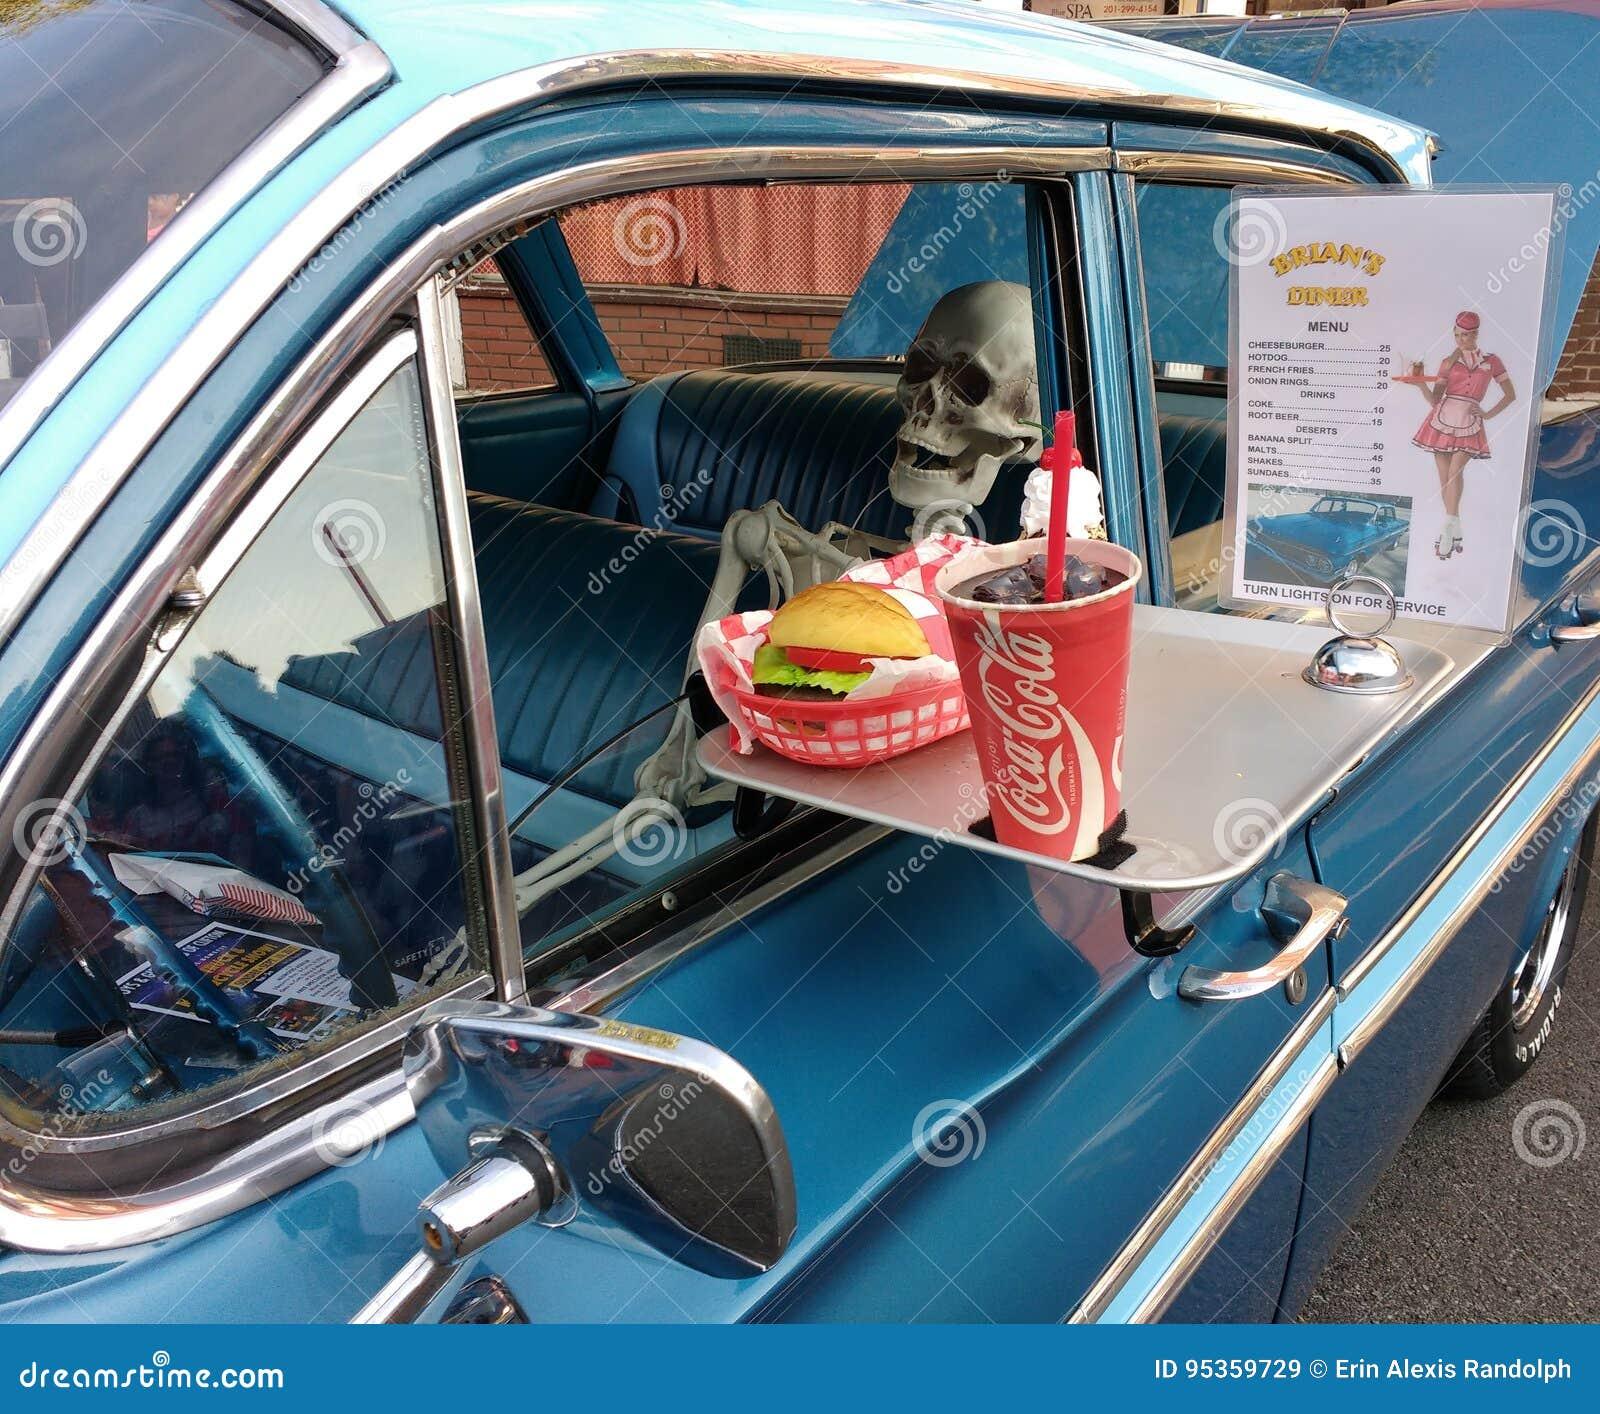 Human Skeleton In A Vintage Car At A Drive In Diner